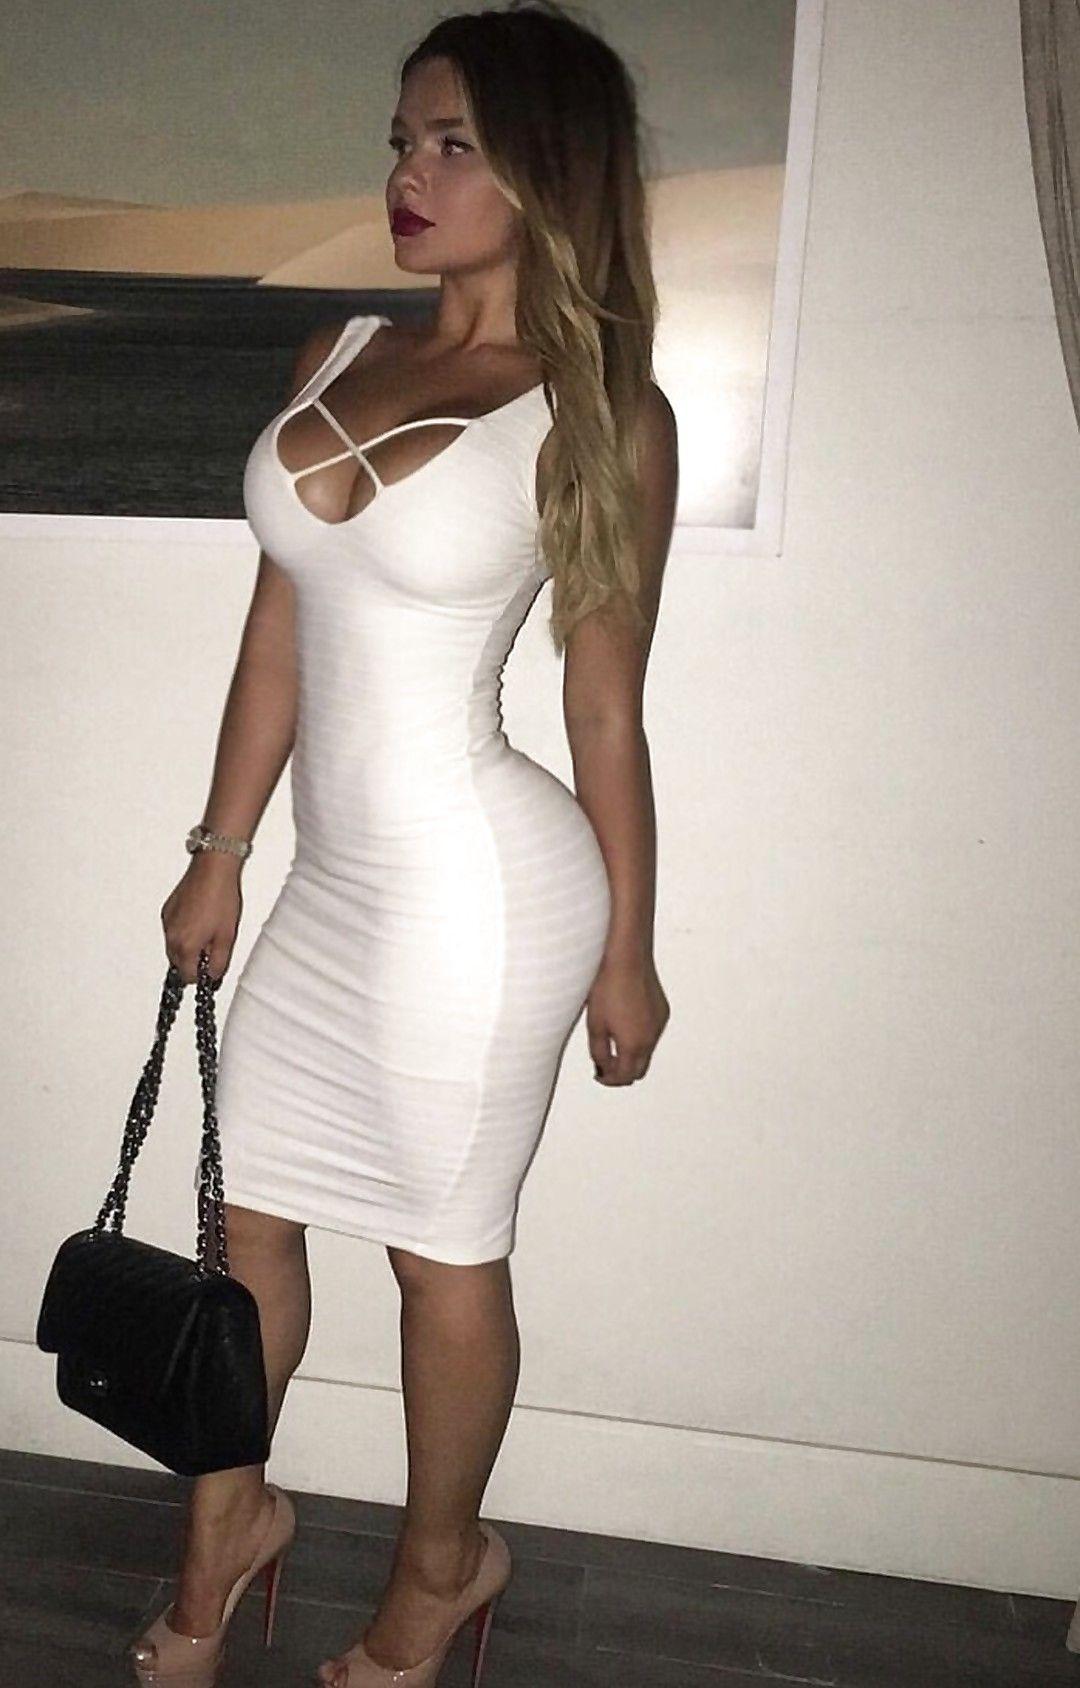 nice butt nude asian chicks sex ebony uk amateur lesbian